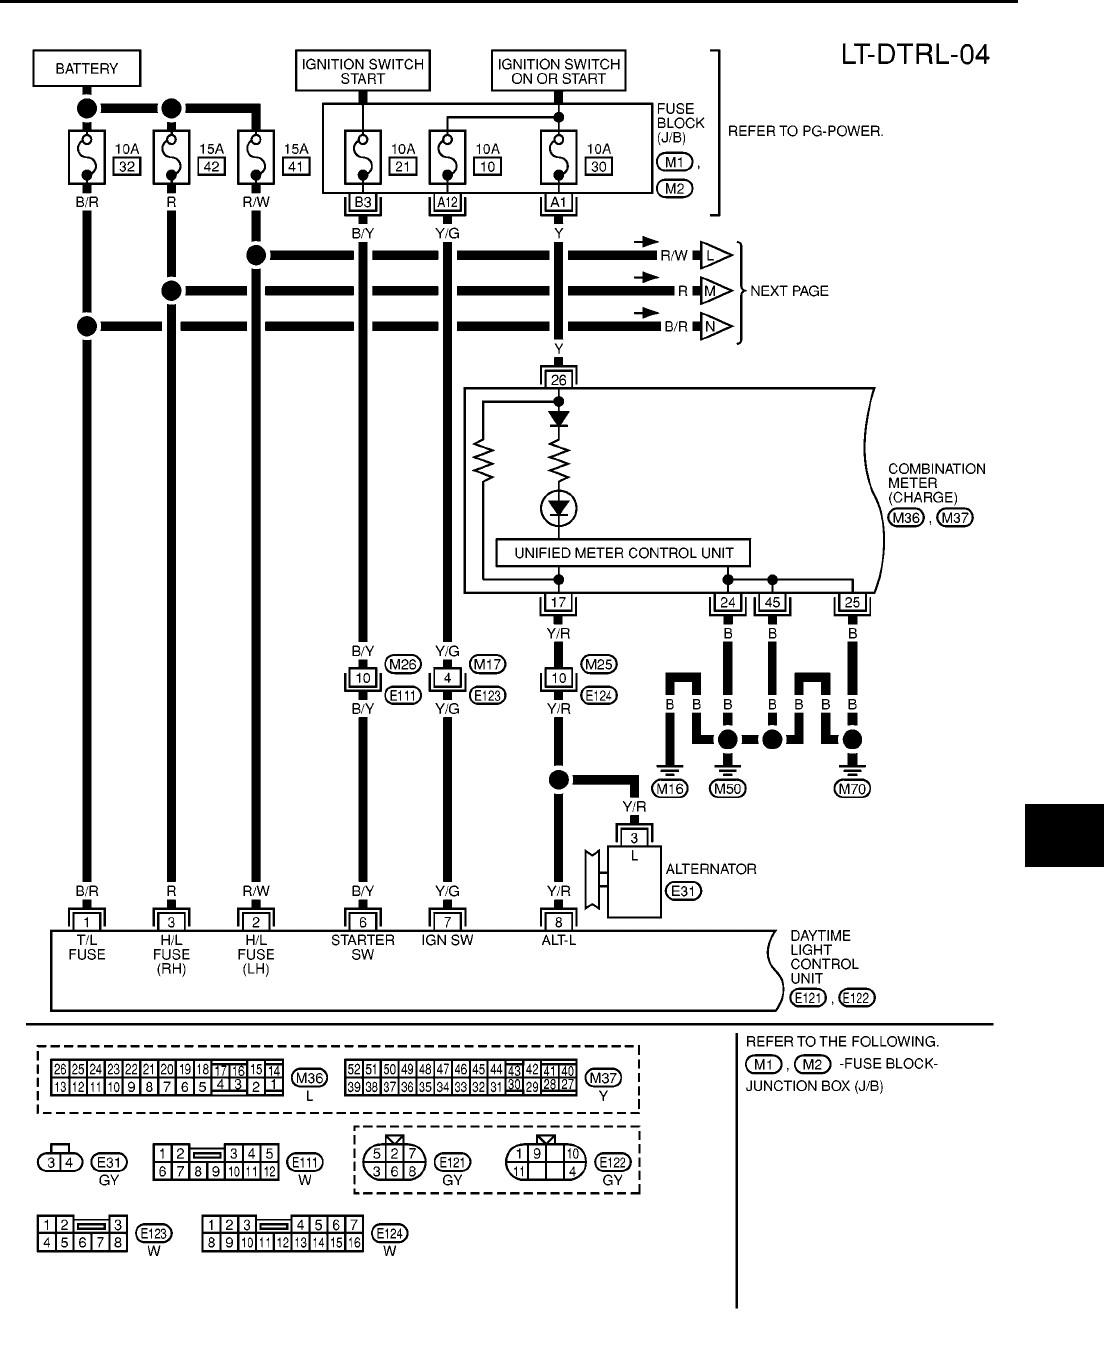 hight resolution of dodge m37 wiring diagram schema wiring diagram dodge m37 wiring diagram wiring library dodge m37 wiring